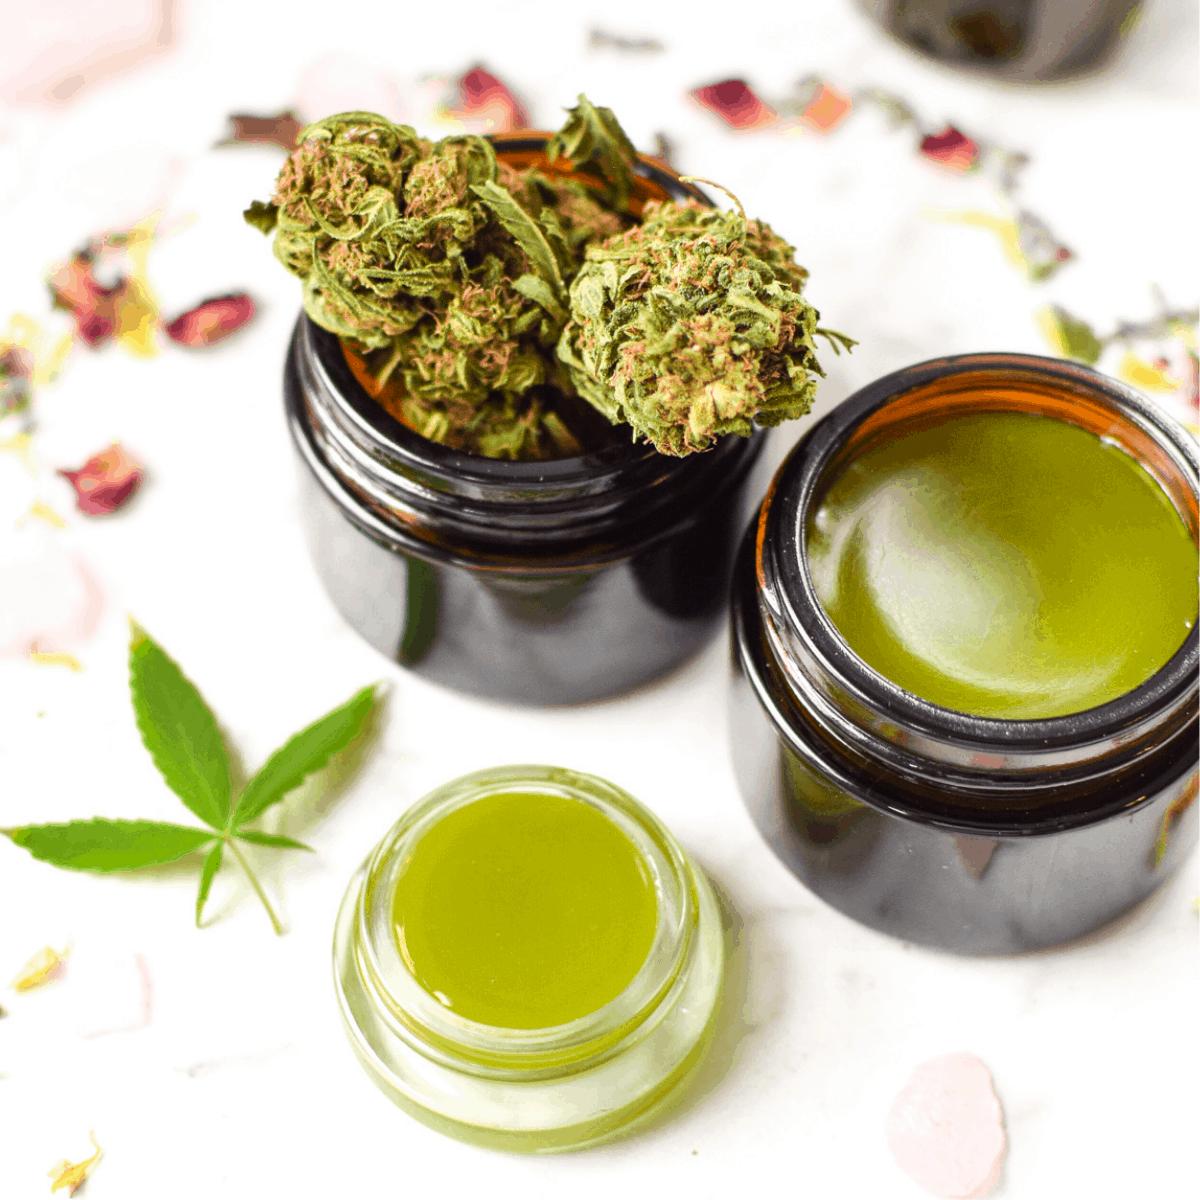 Make Your Own Cannabis Salve